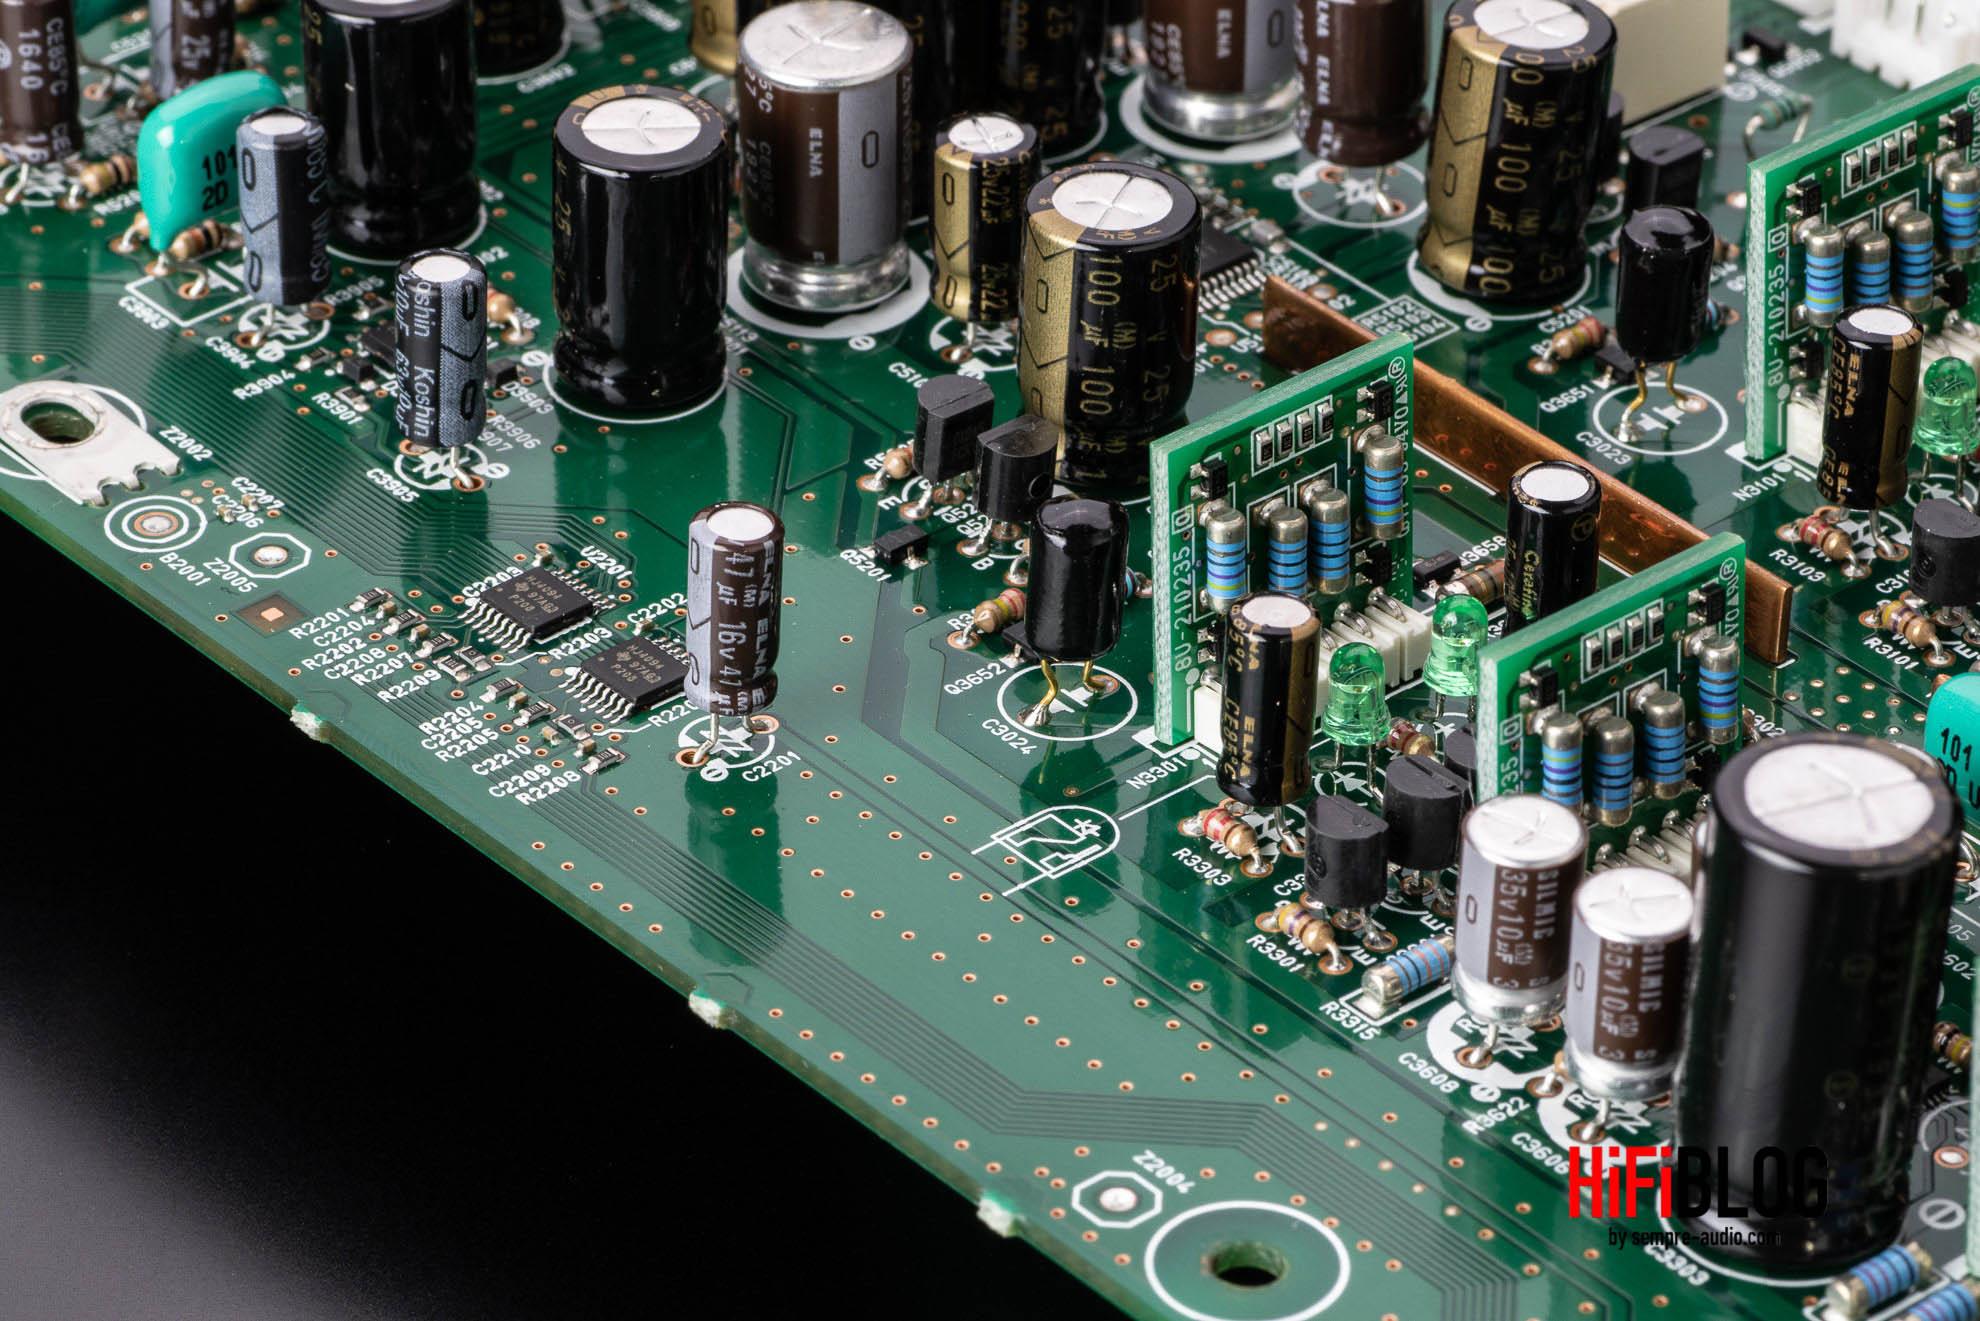 Marantz Model 30 Integrated Amplifier and SACD 30n Network SACD Player 25